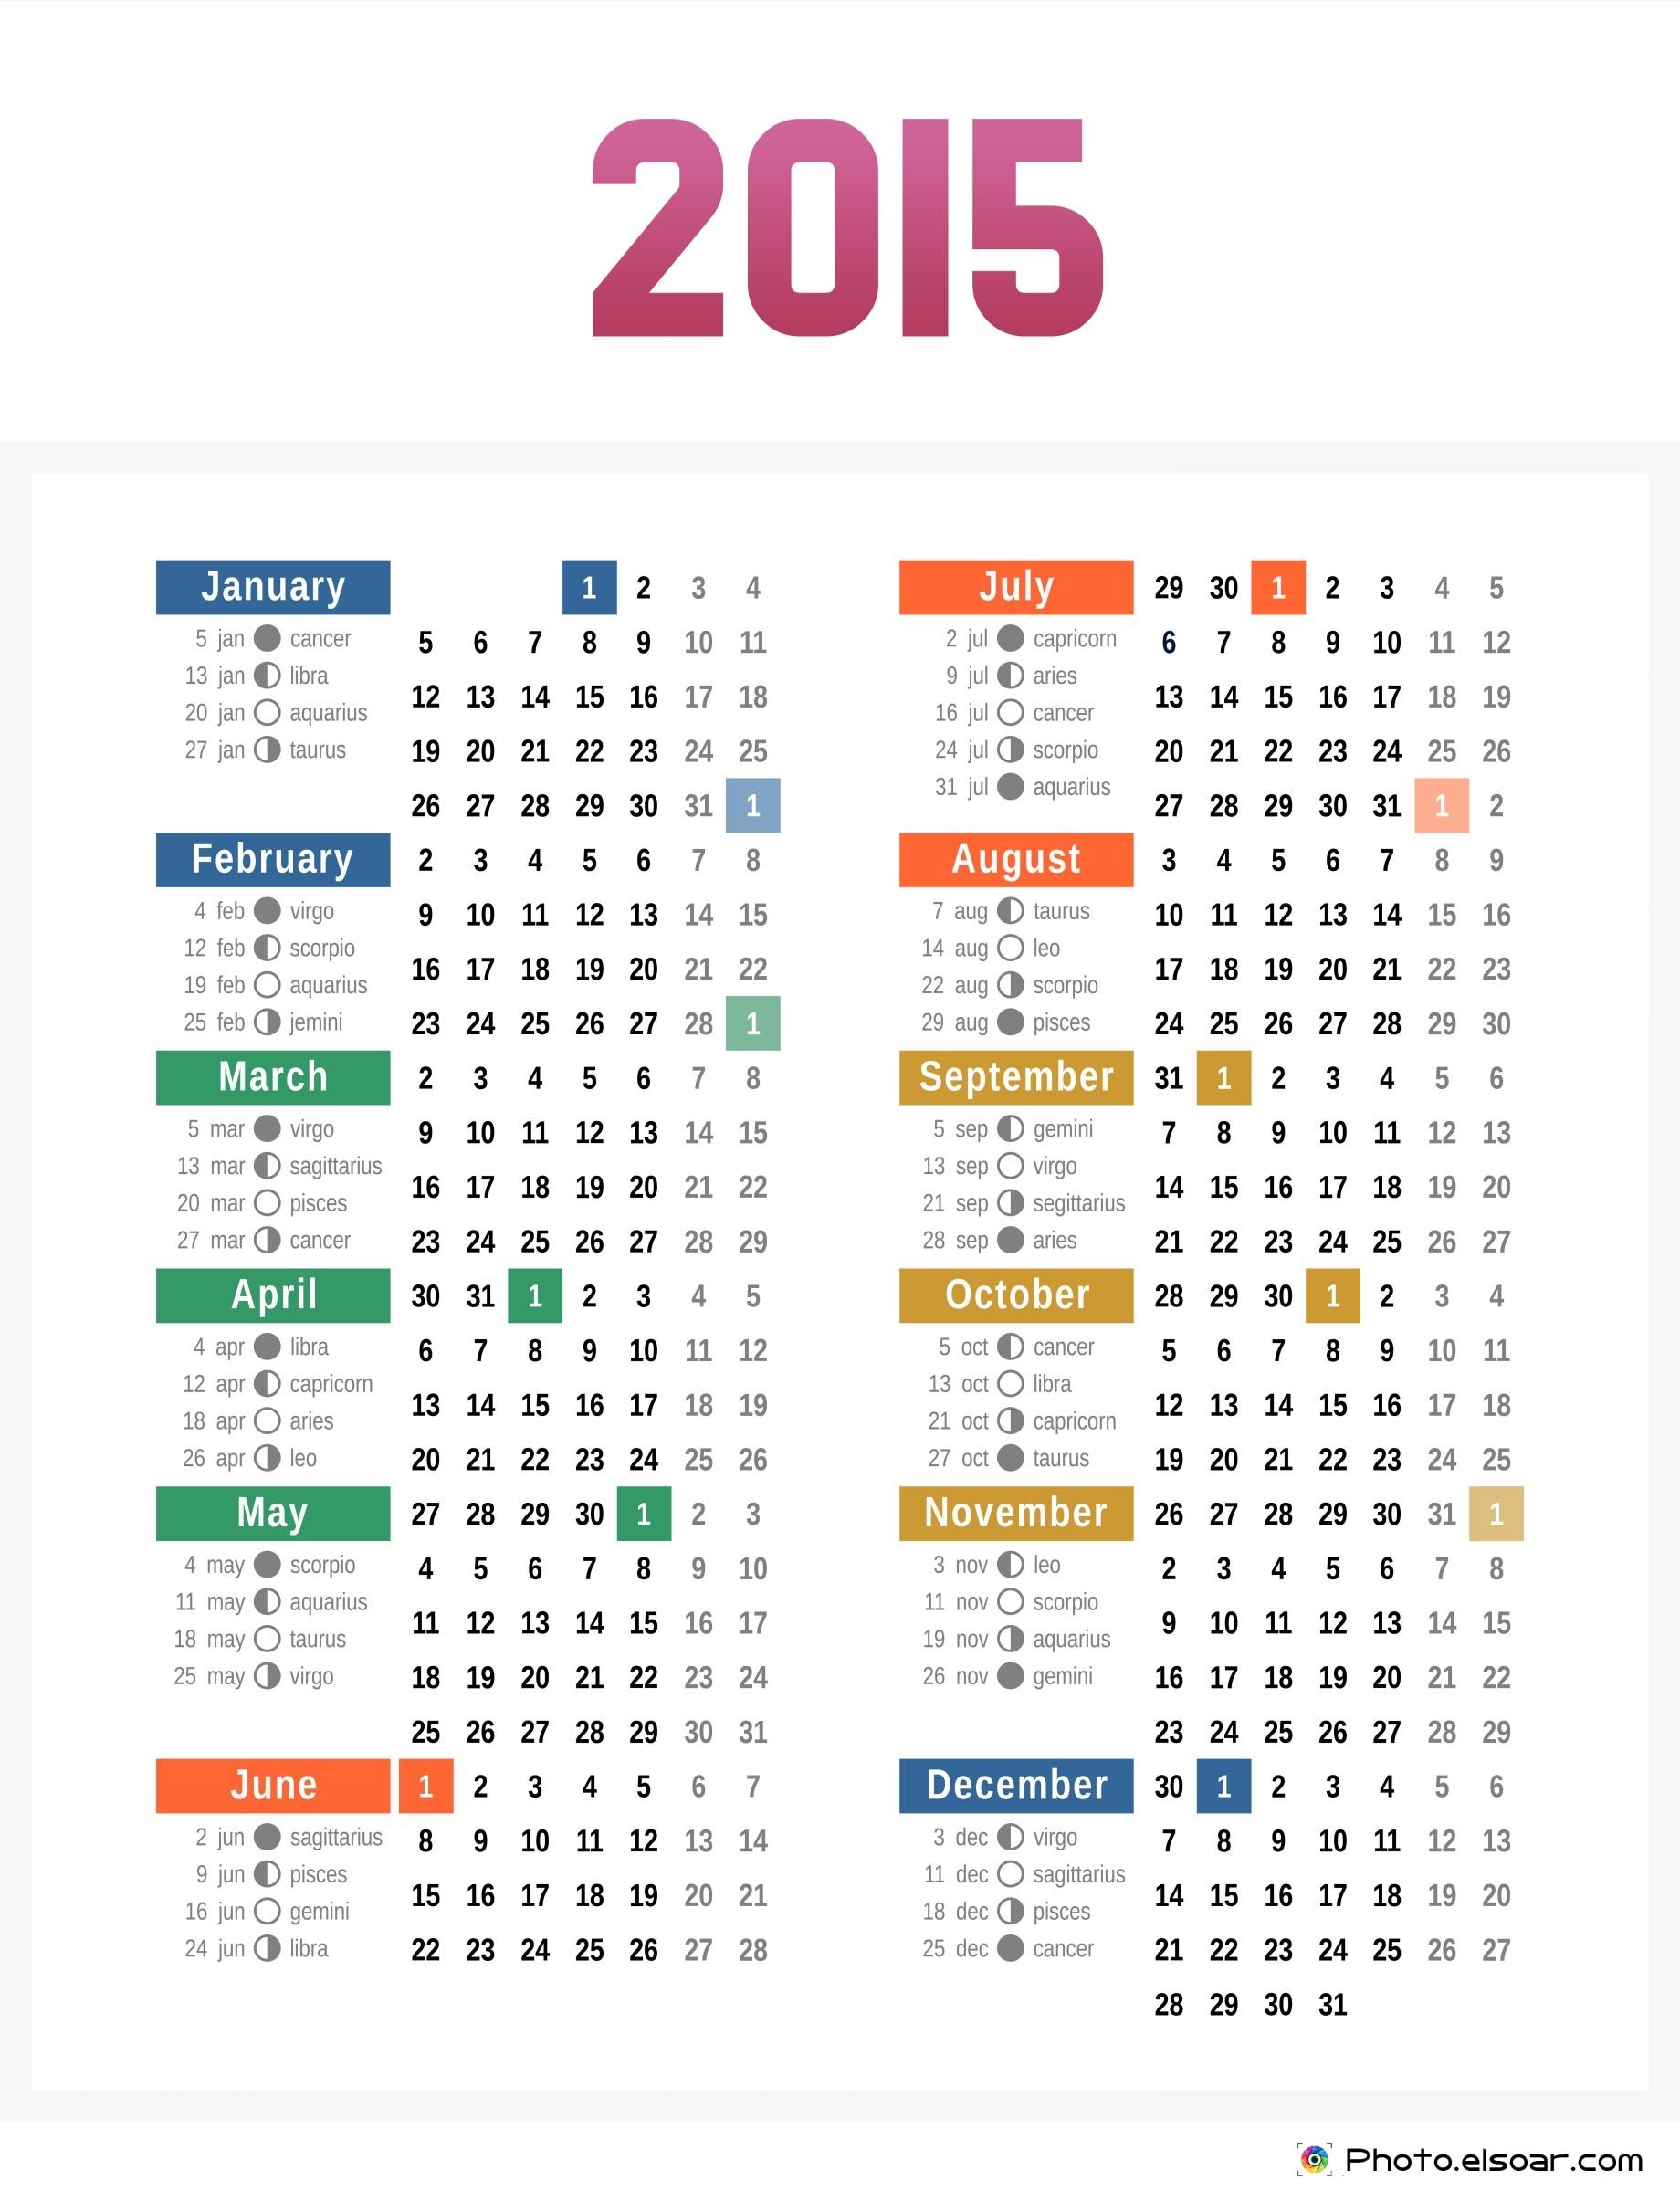 2015 Calendar with Seasons